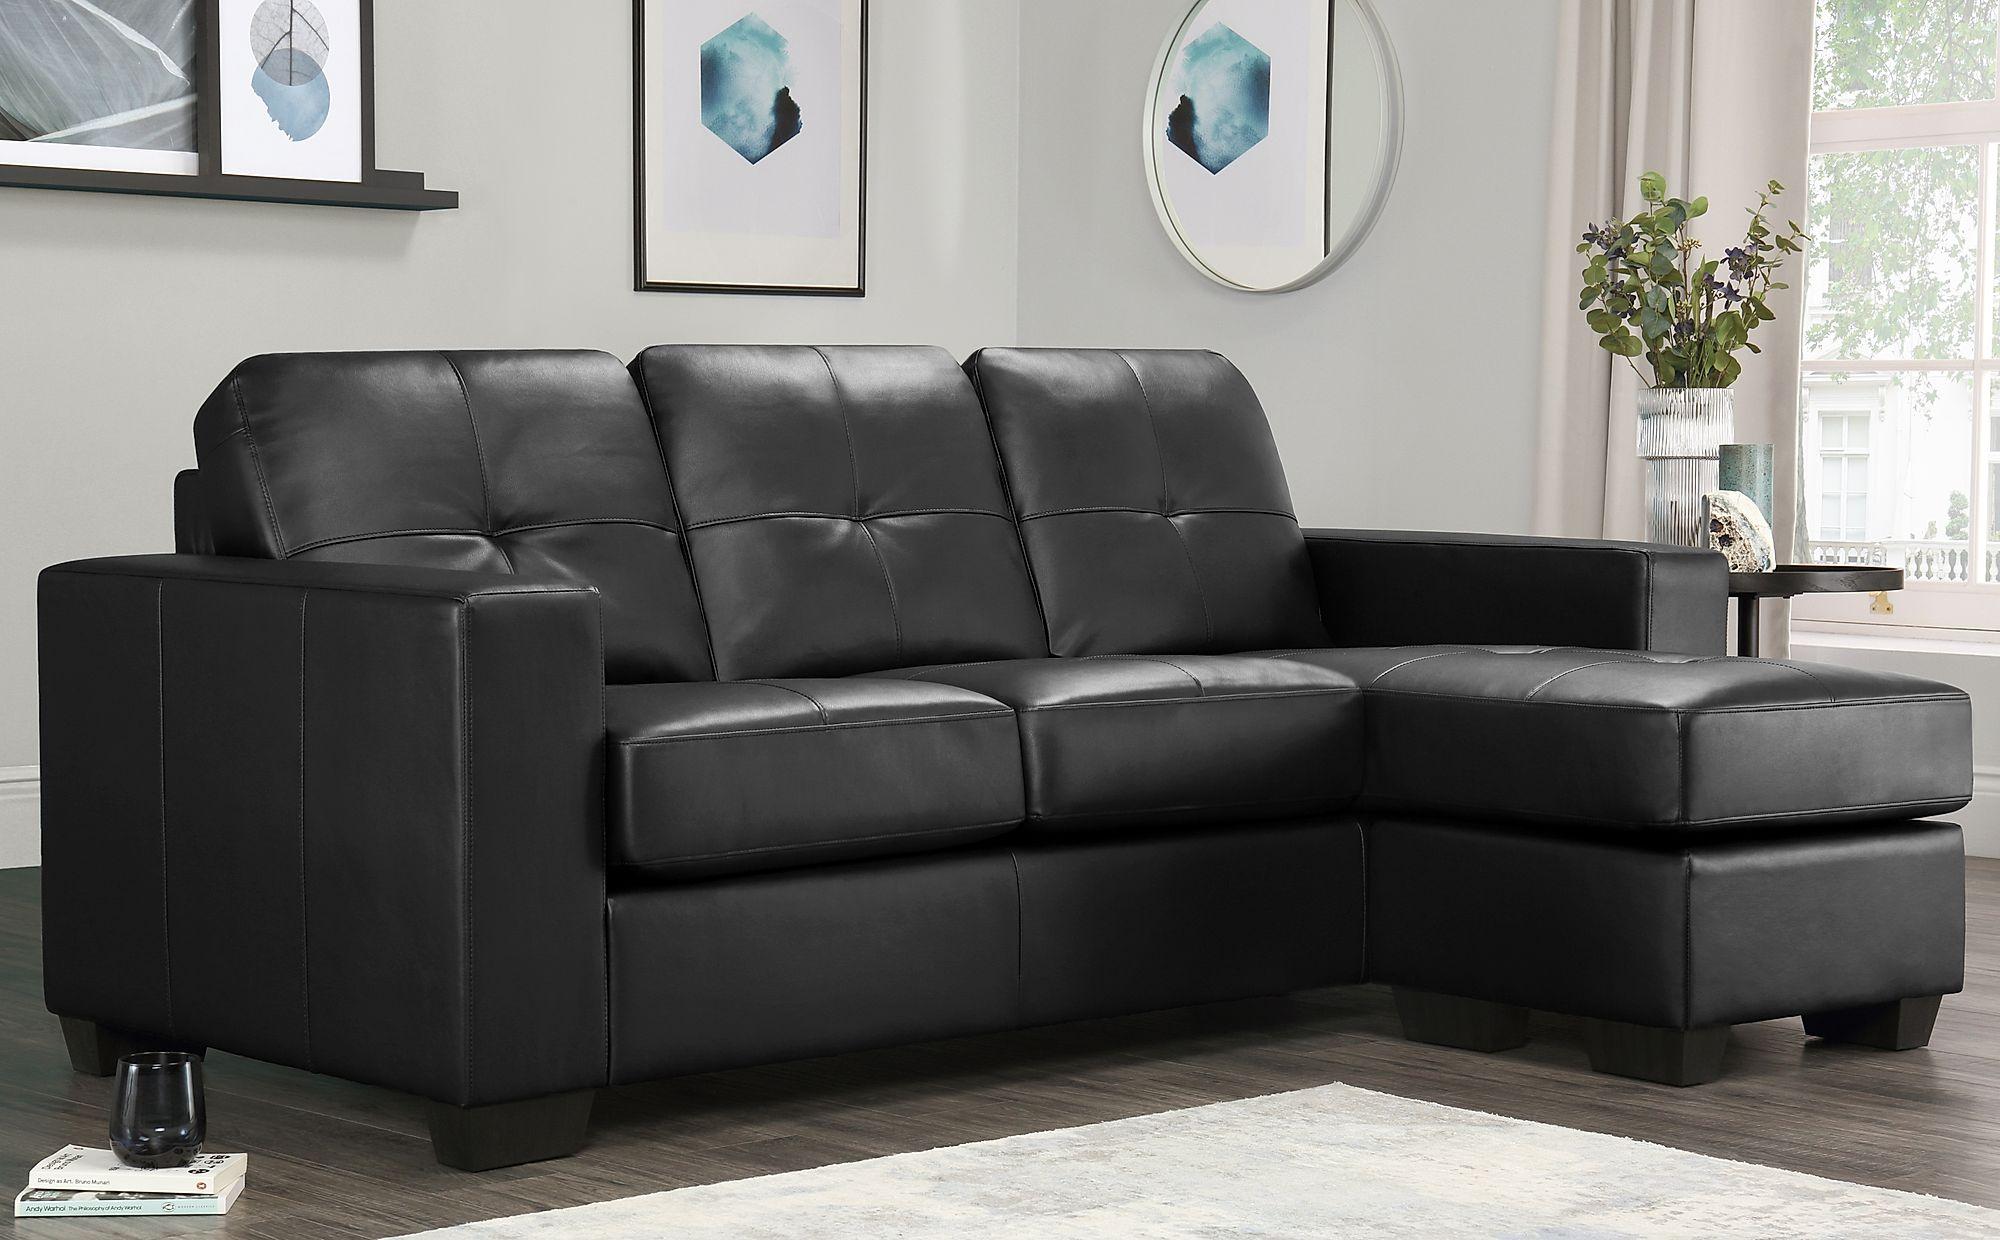 Rio 3 seater Leather Corner Sofa £499.99 at Furniture Choice